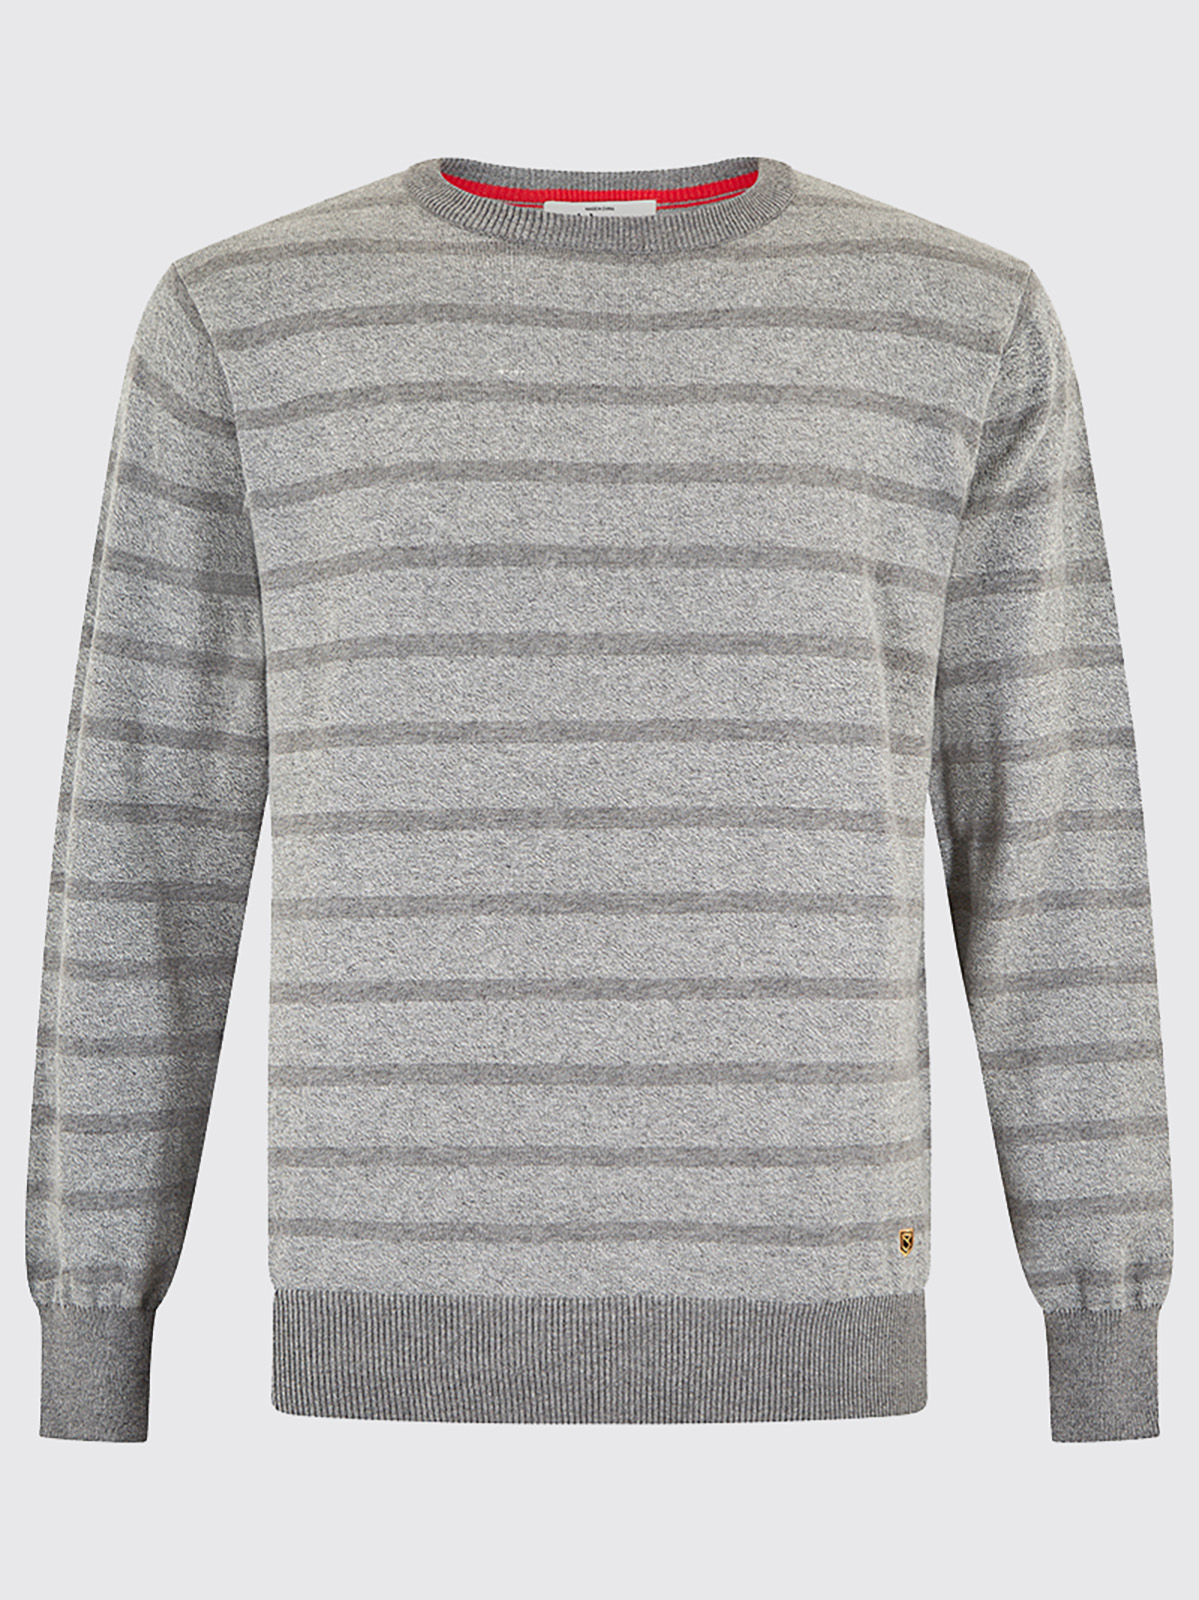 Avondale Sweater - Grey Multi